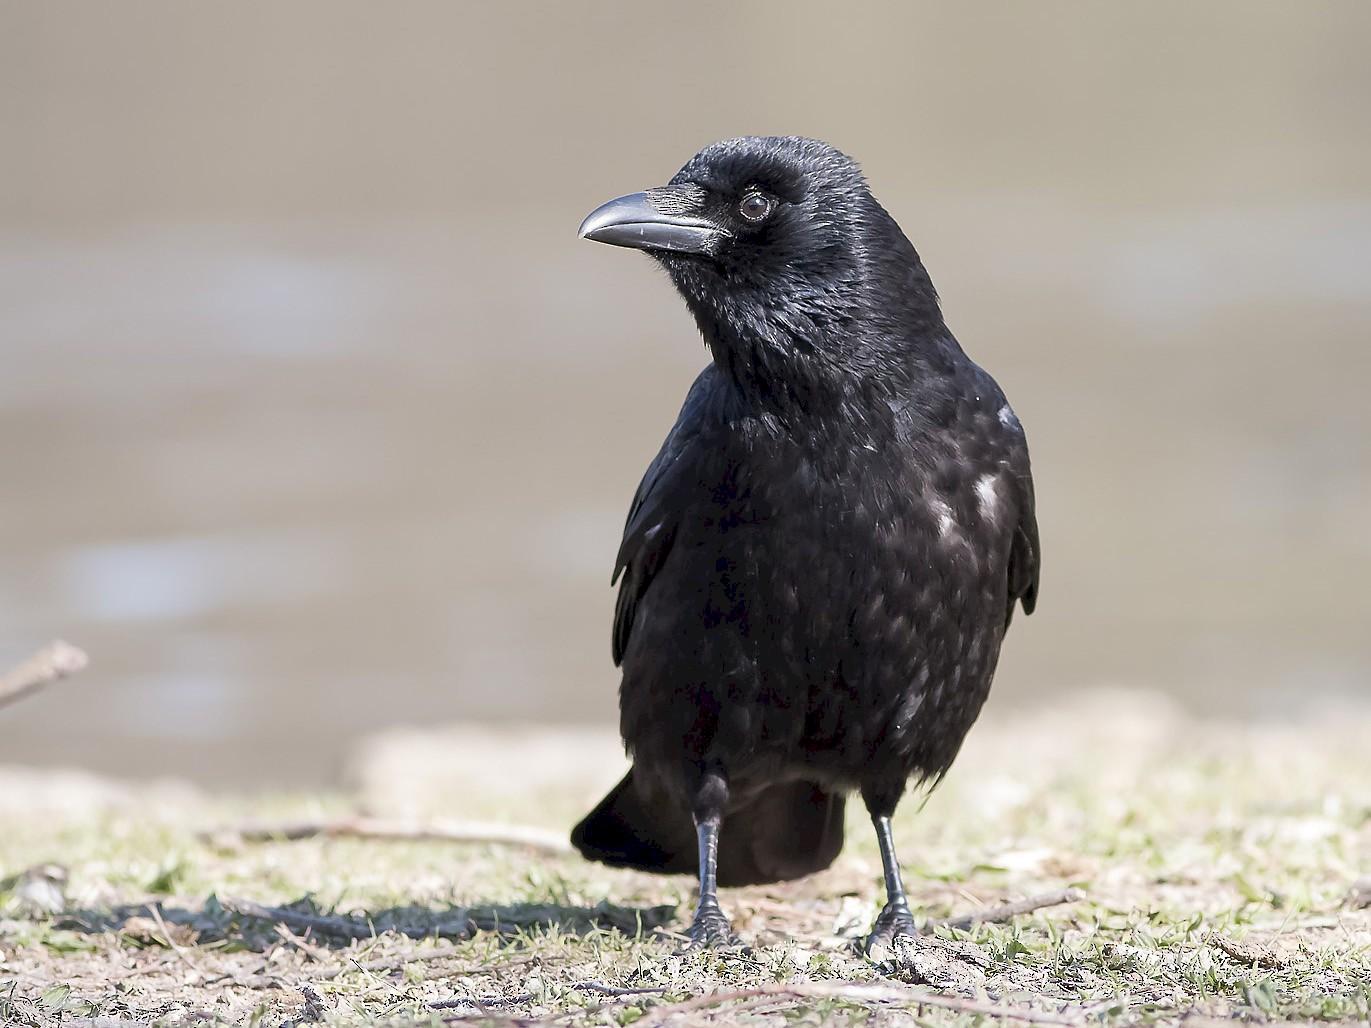 Carrion Crow - Ruud Visser